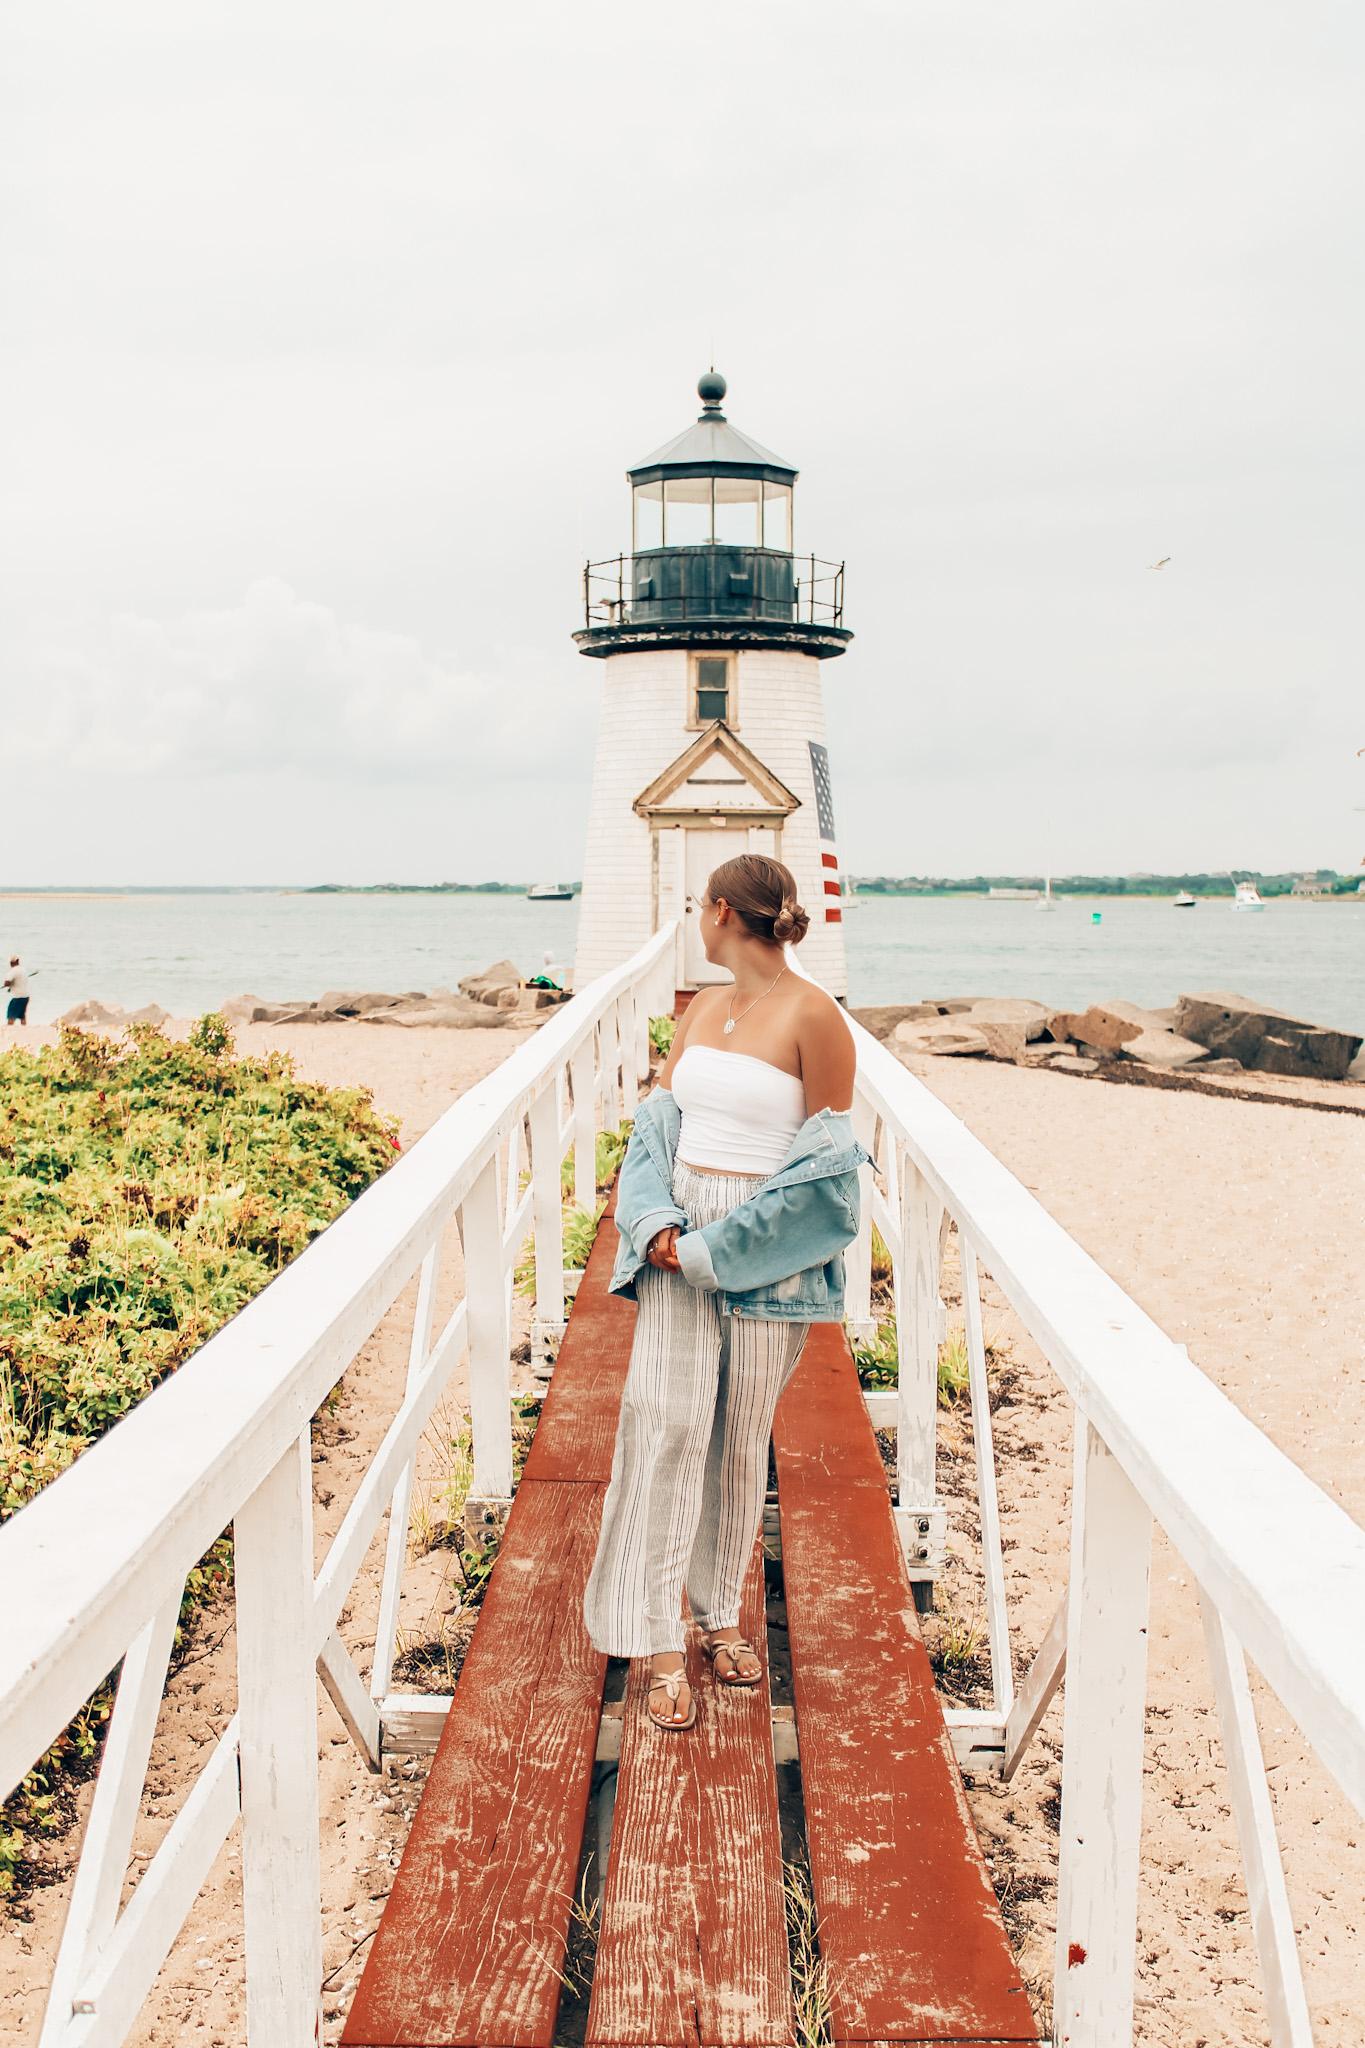 Add Nantucket to your New England bucket list